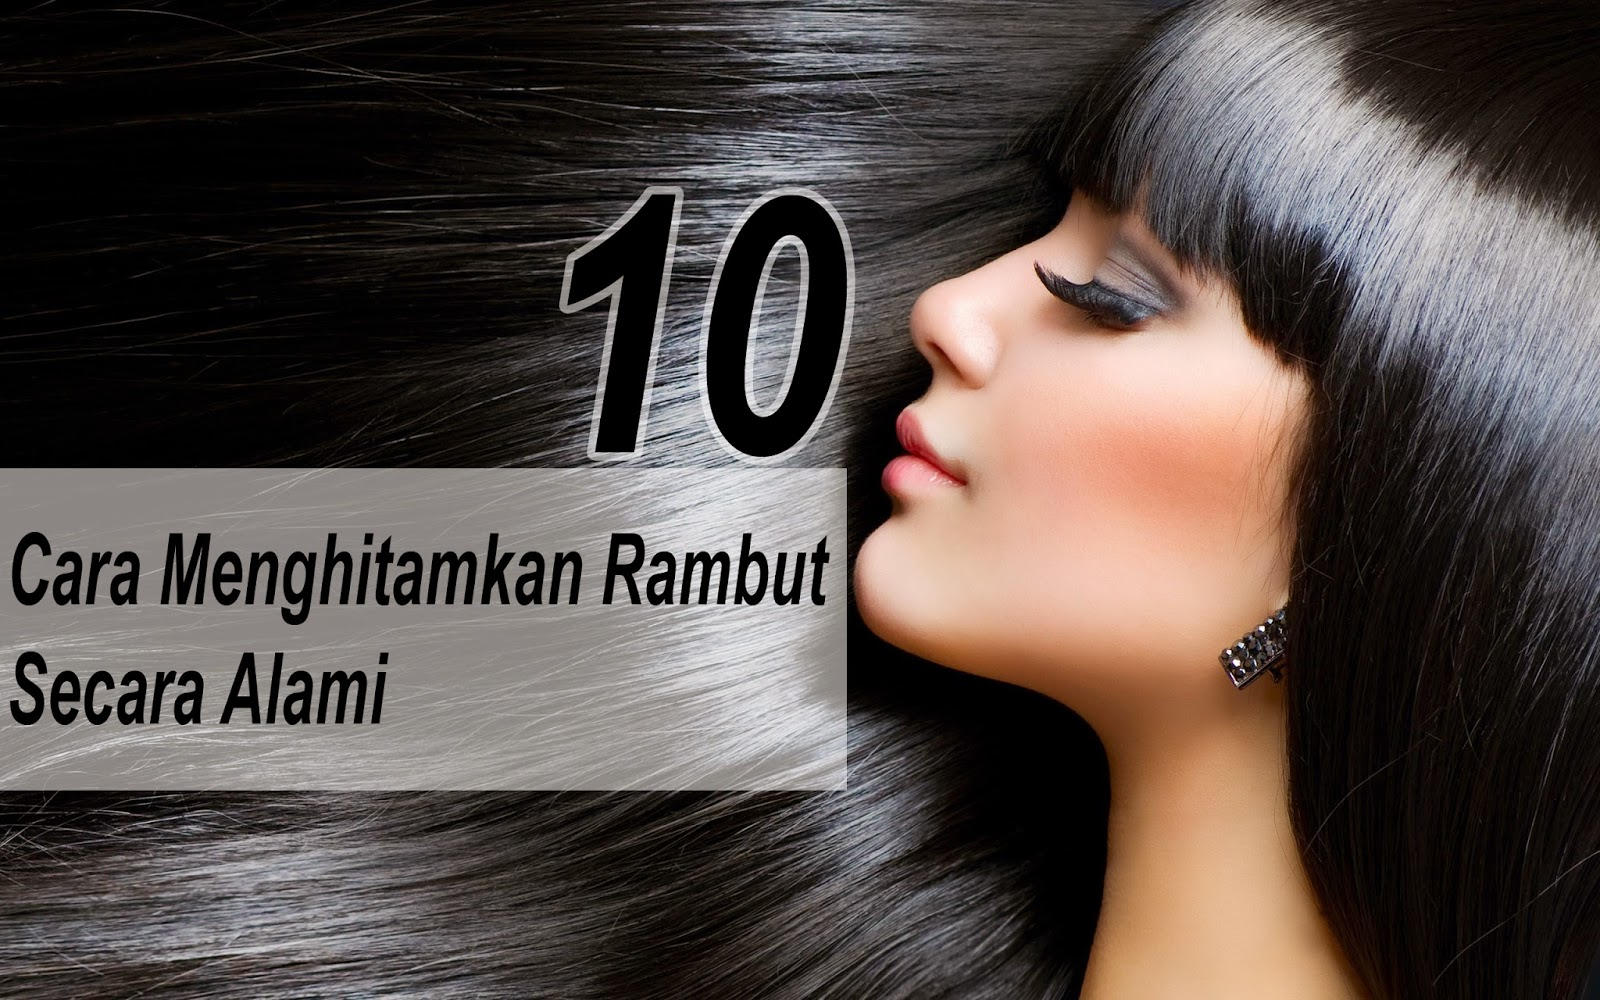 yang indah niscaya menjadi impian bagi setiap orang 10 Cara Menghitamkan Rambut Secara Alami